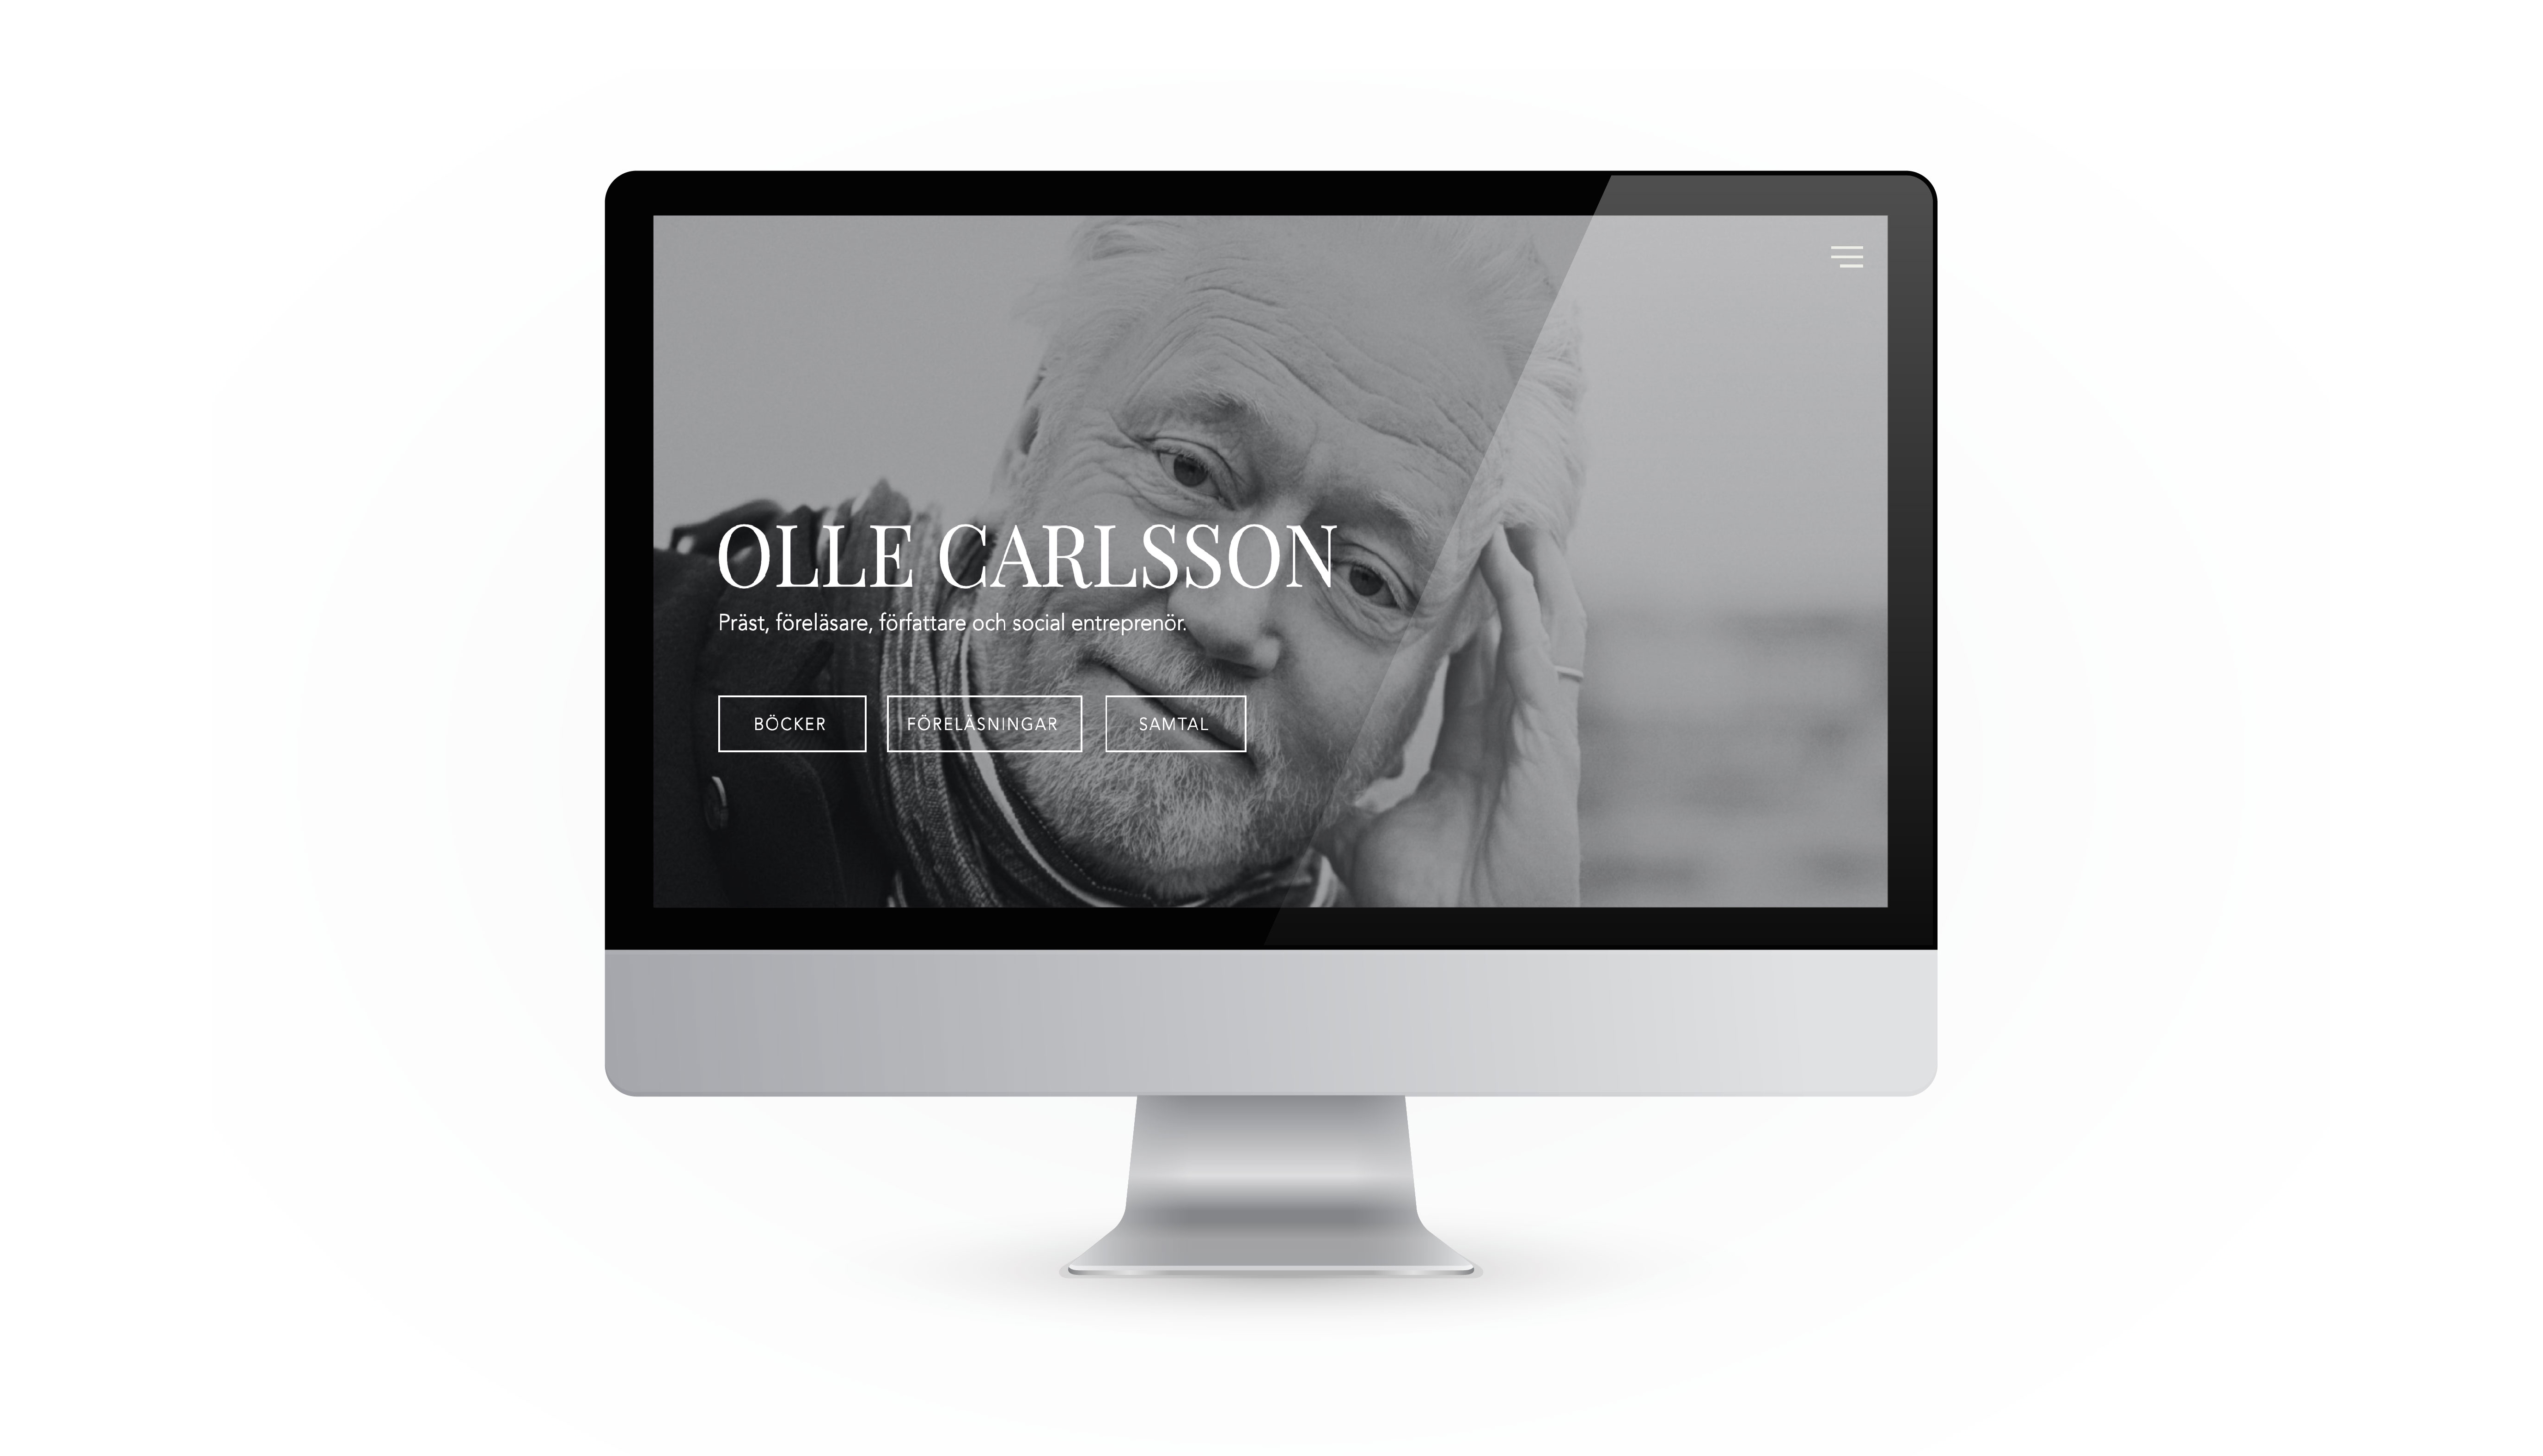 Olle Carlsson Website design